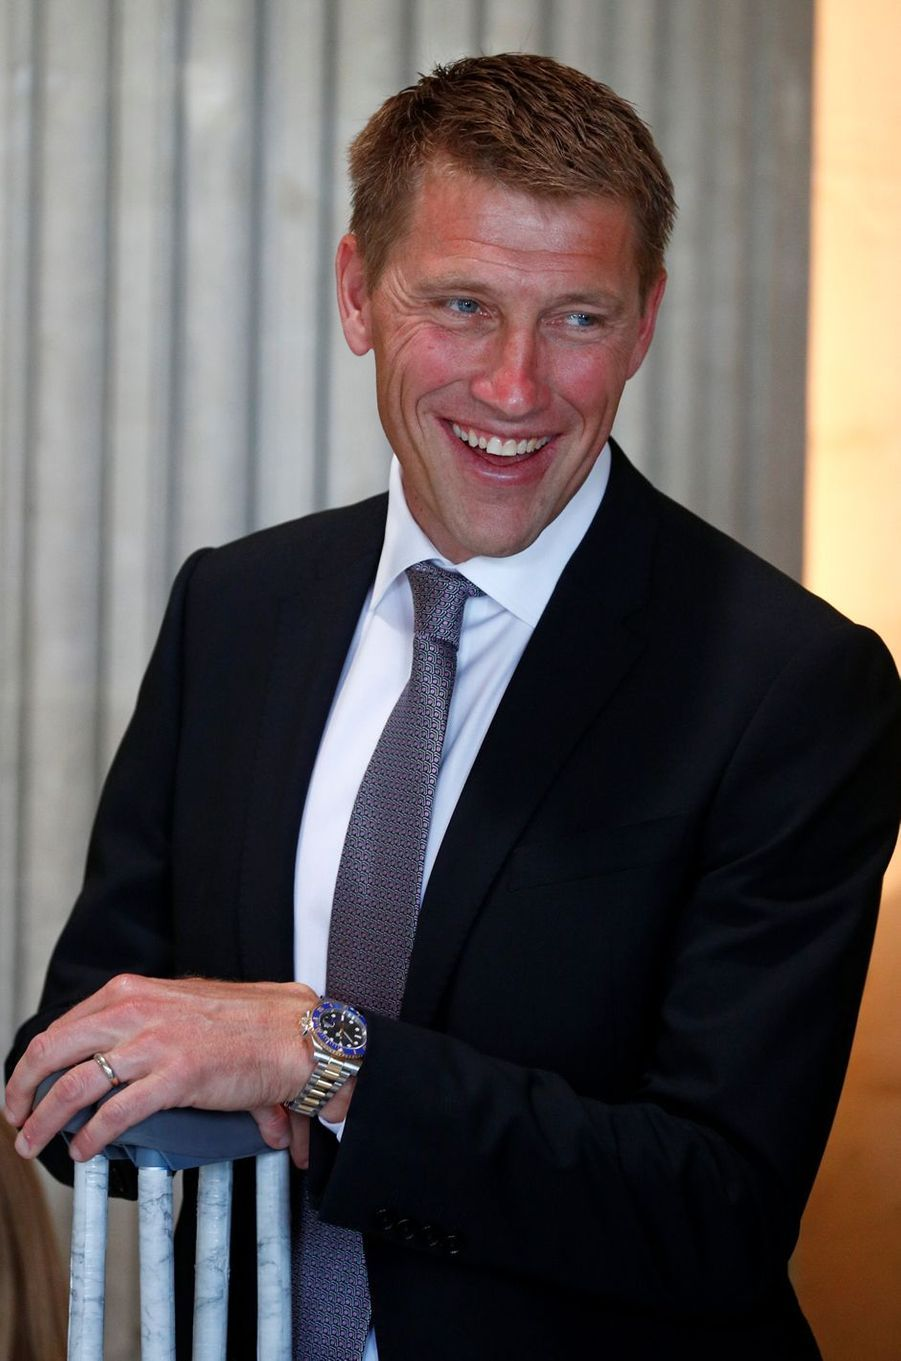 Axel, le fils d'Eddy Merckx, à Bruxelles le 5 juillet 2019